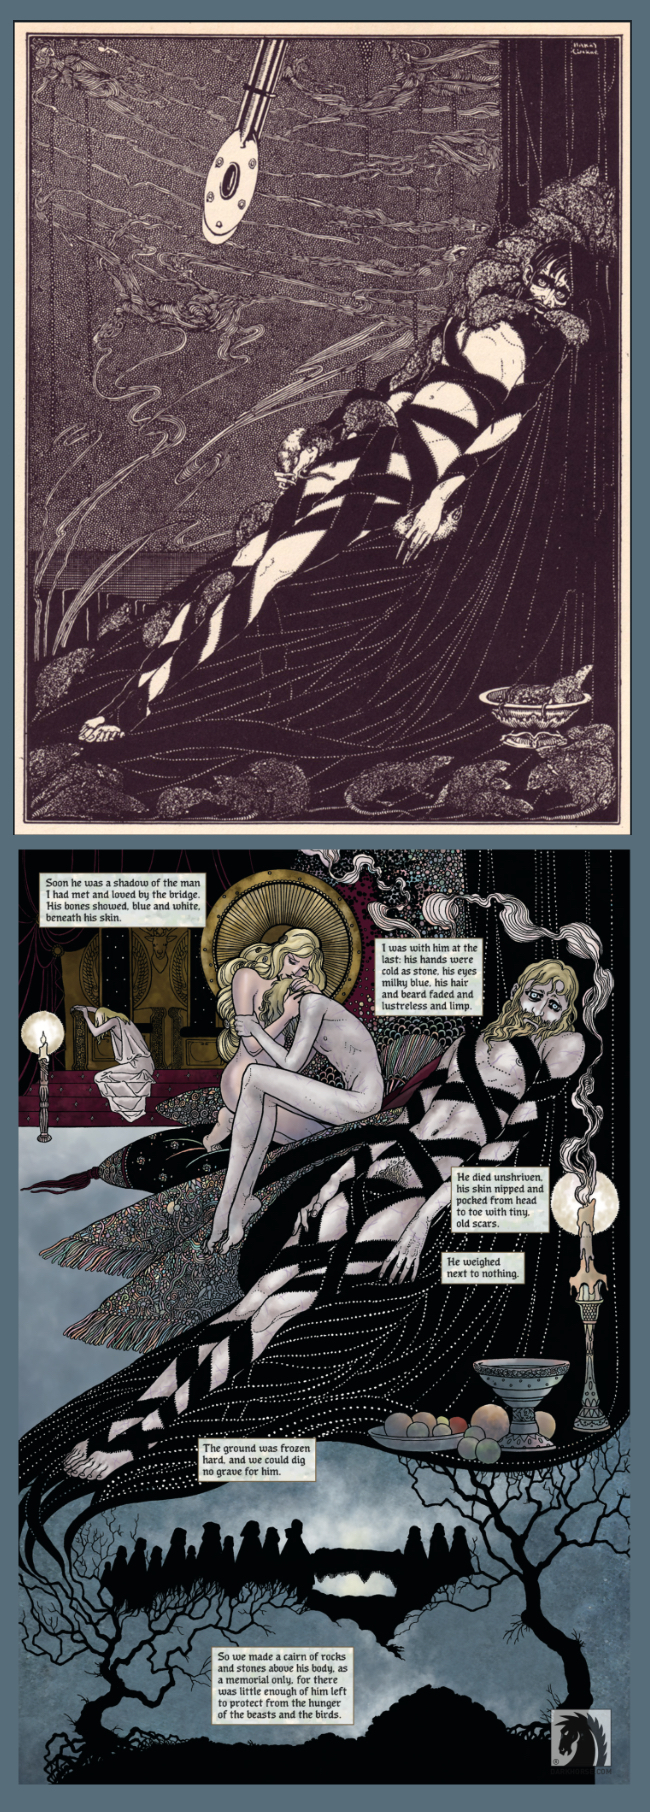 dark horse comics, neil gaiman, colleen doran, snow glass apples, graphic novels